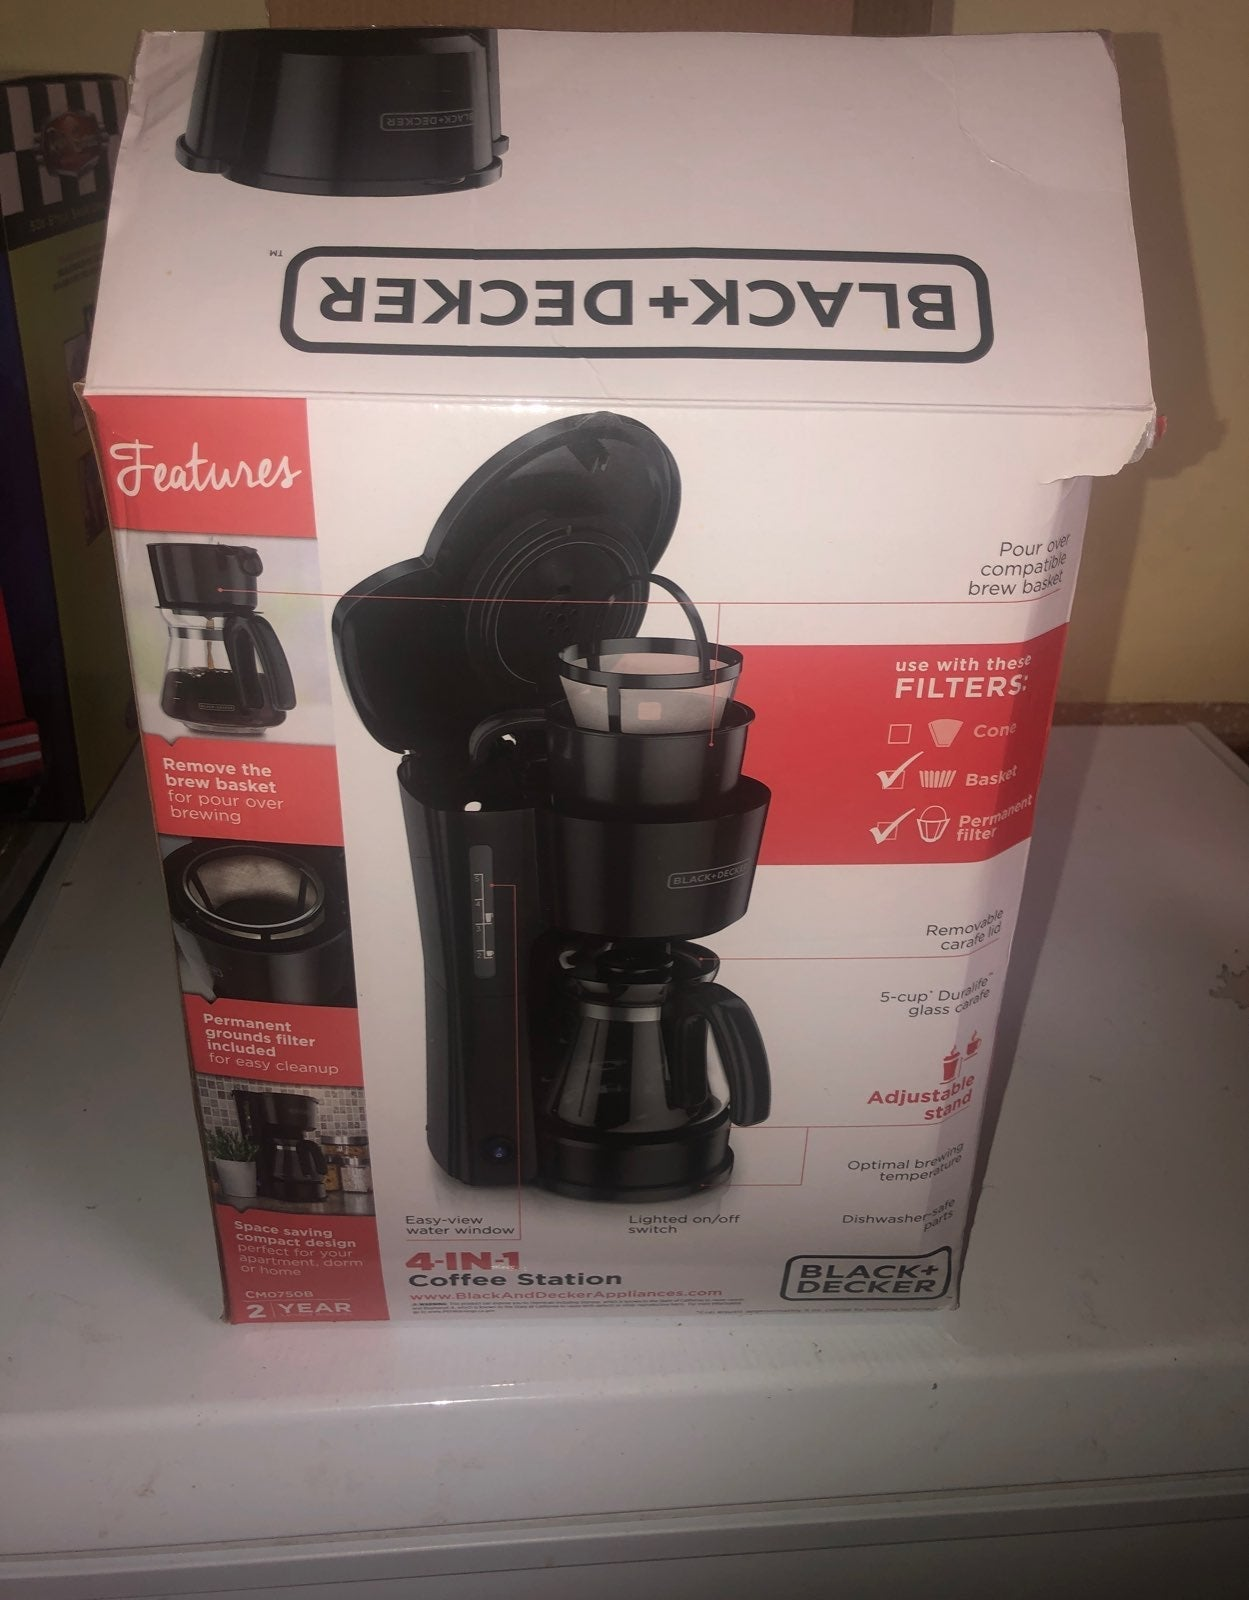 New! Black Decker 4-In-1 Coffee Station